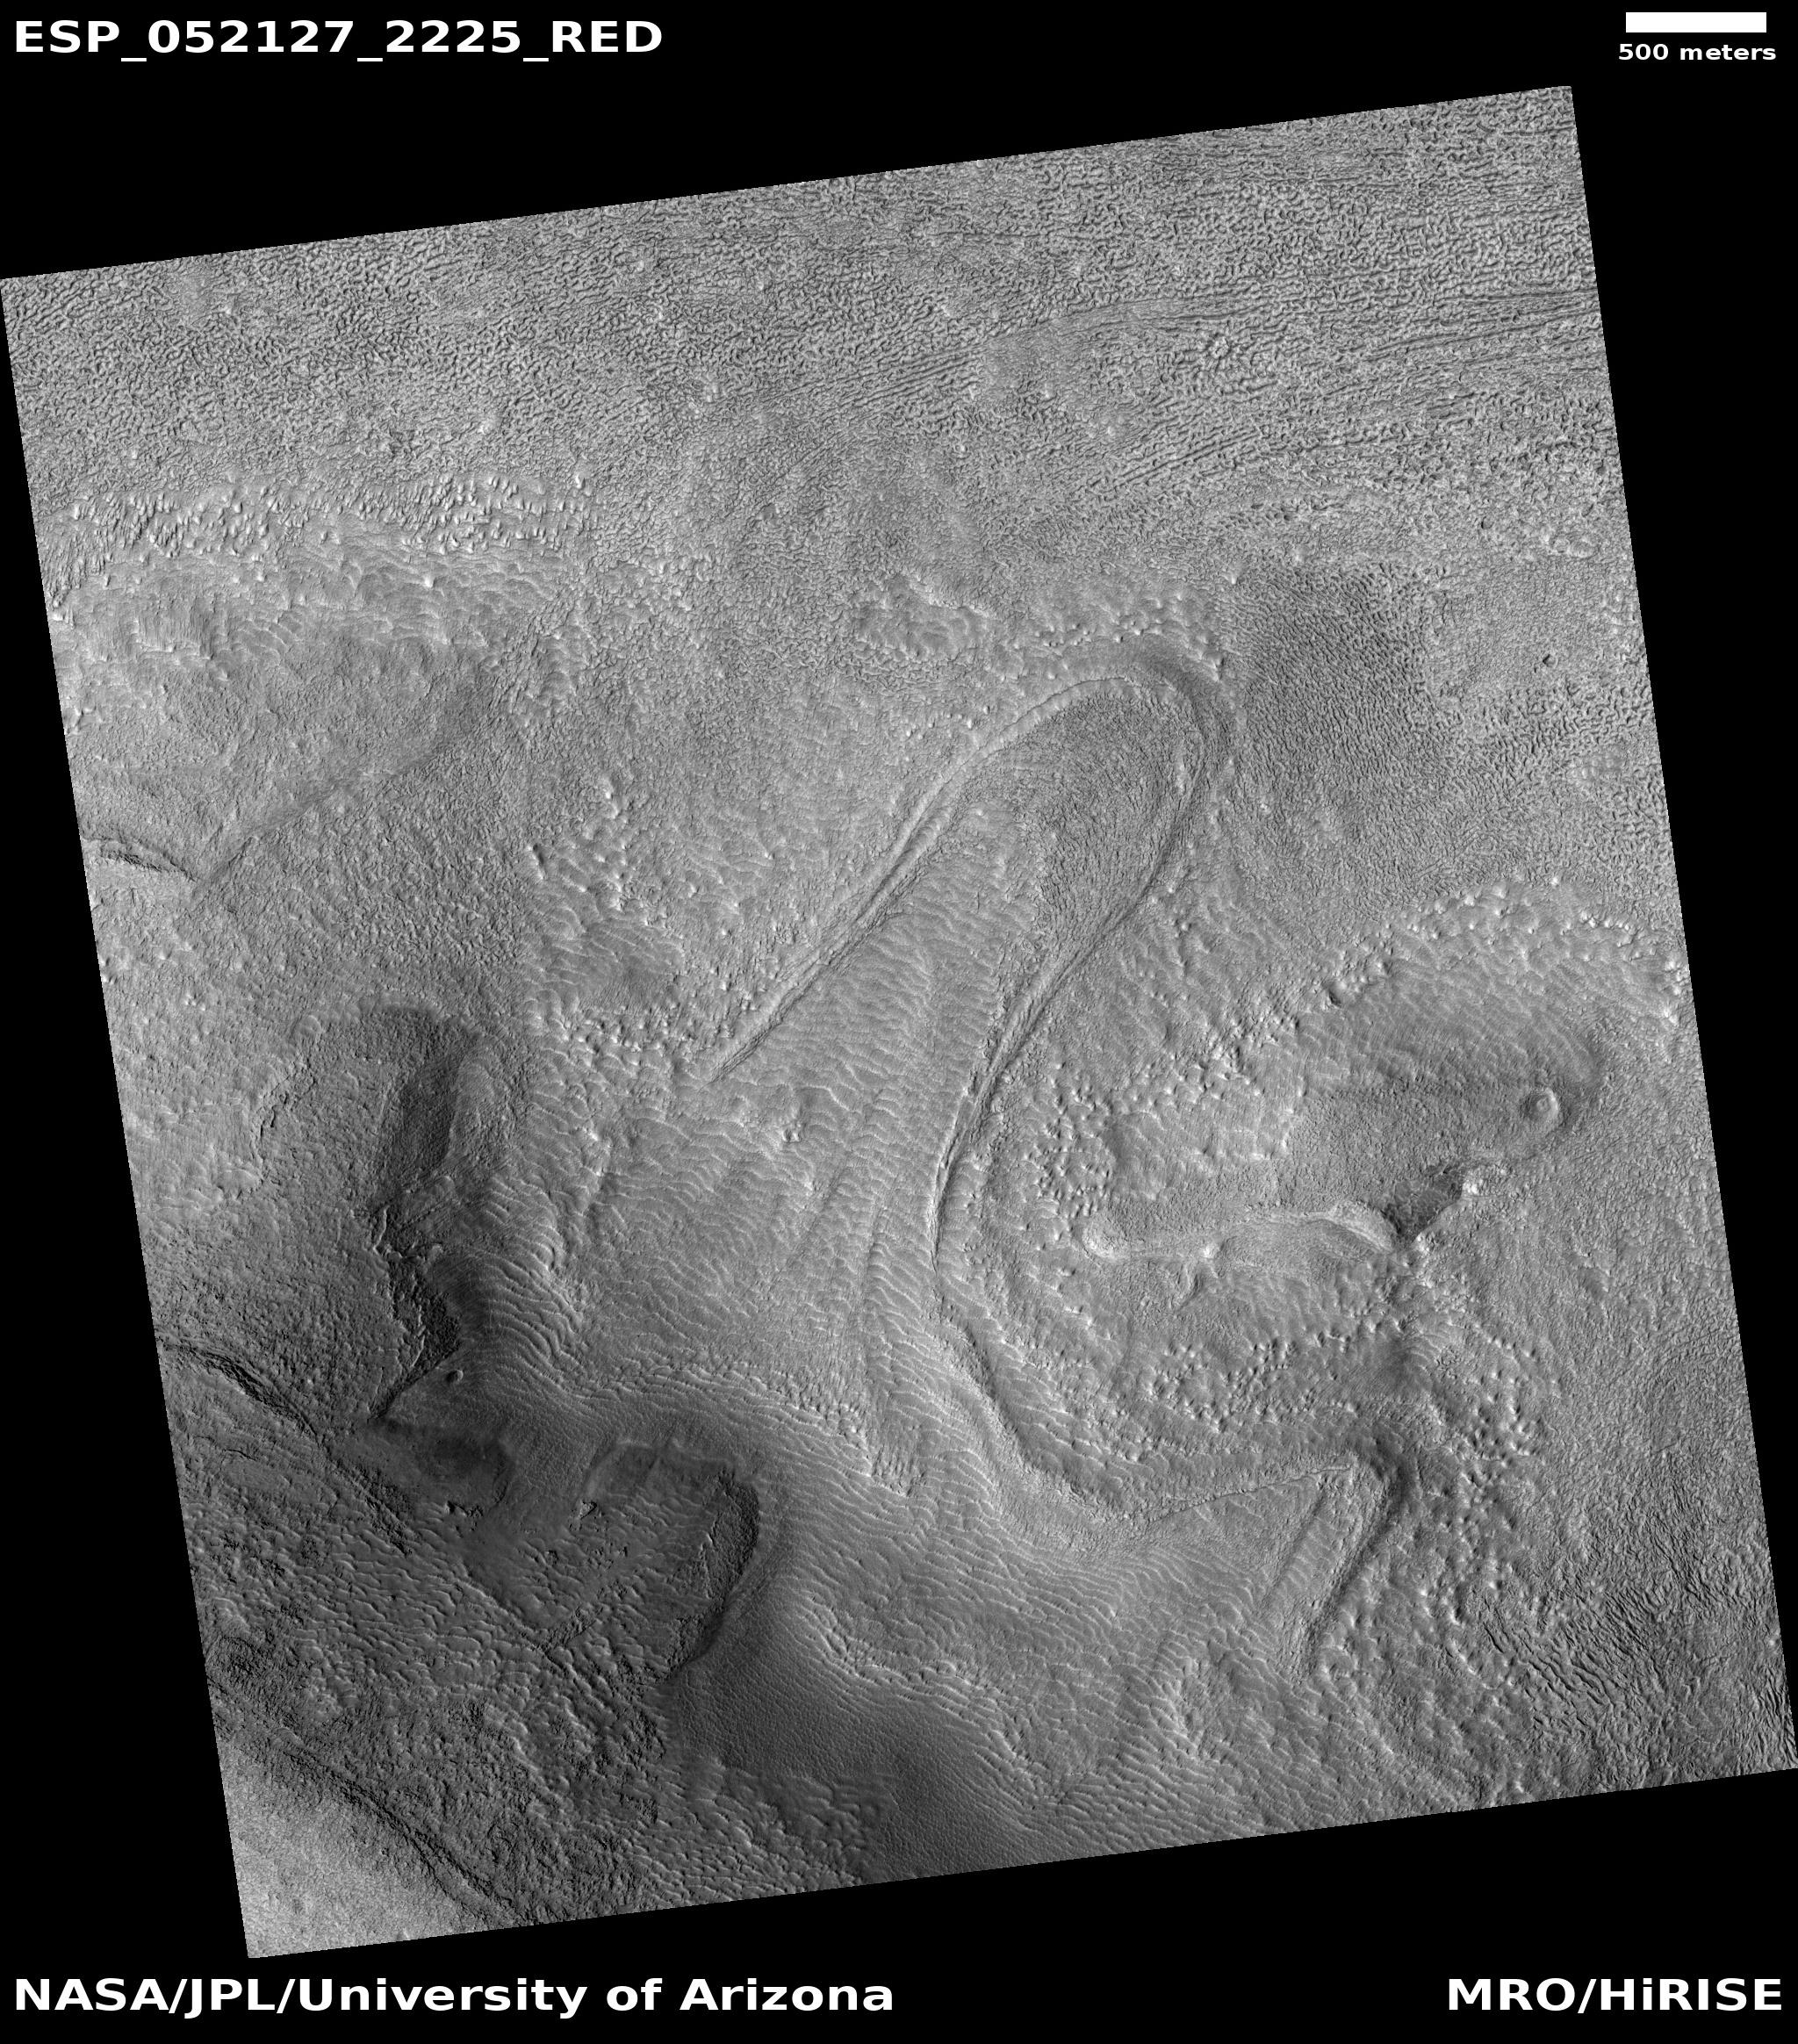 Flow, as seen by HiRISE under HiWish program